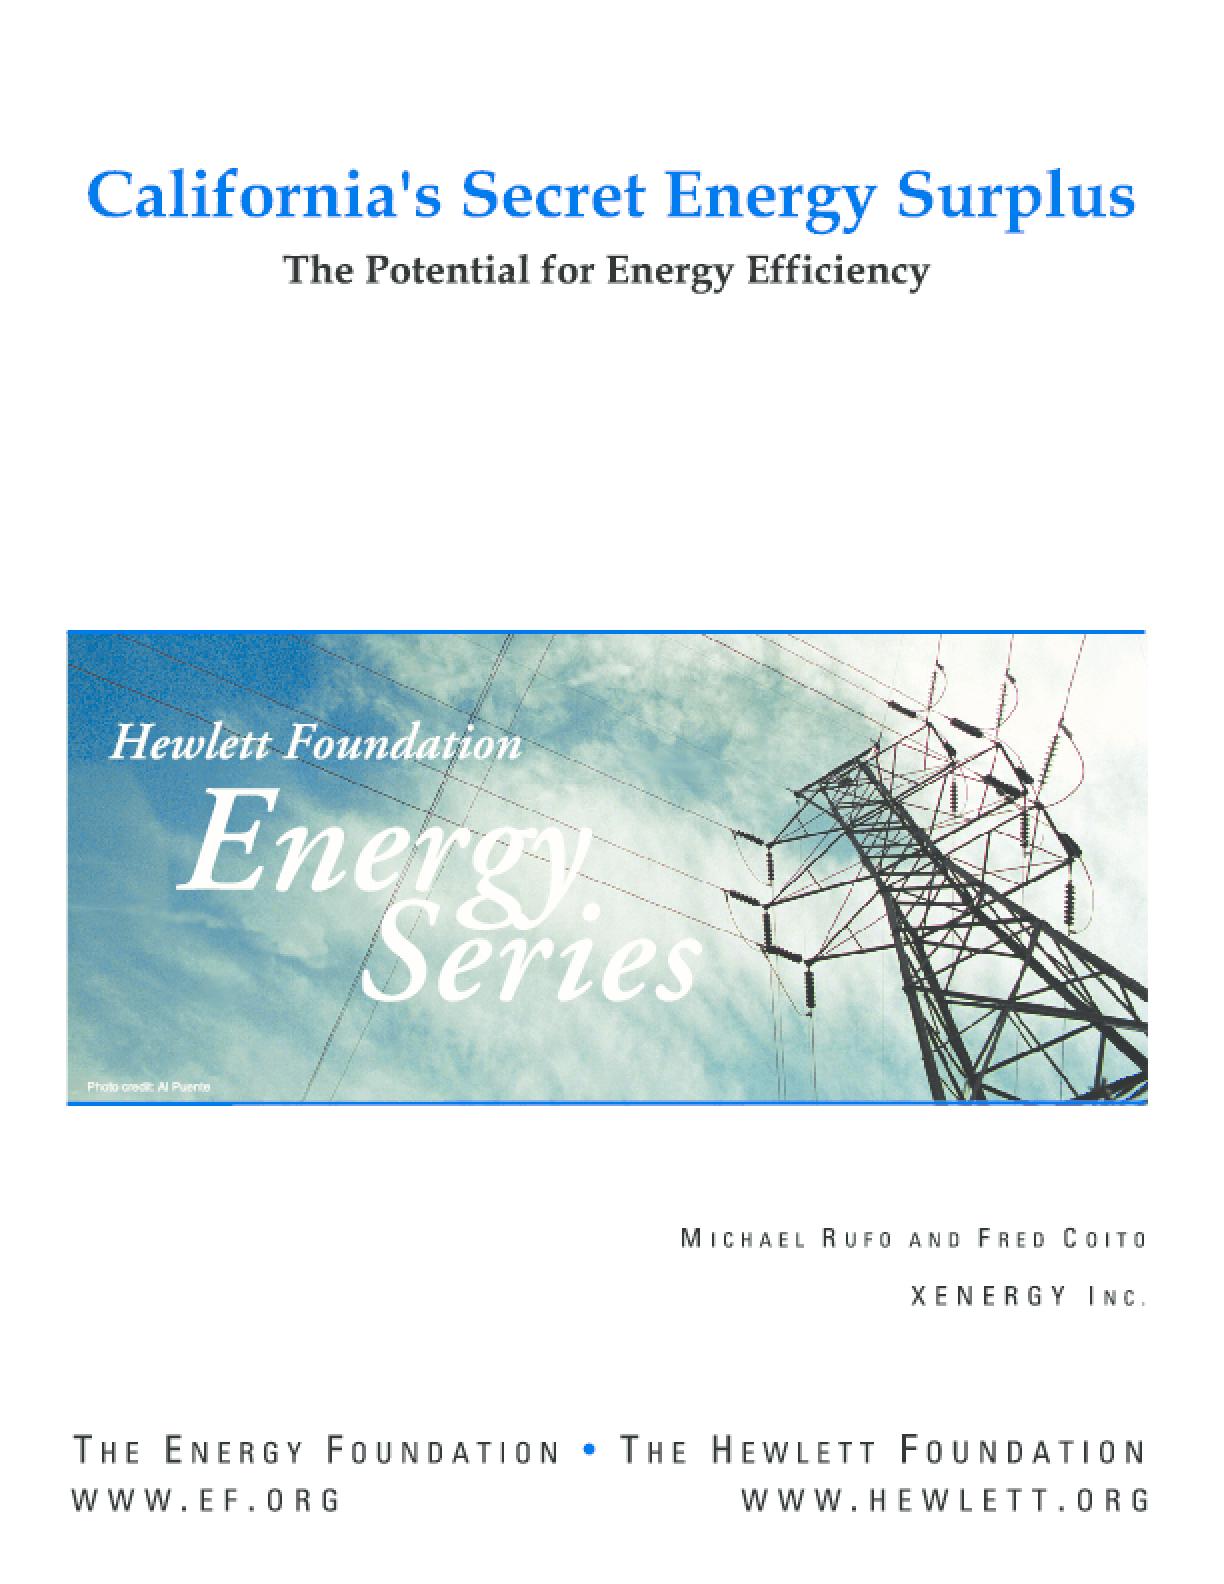 California's Secret Energy Surplus: The Potential for Energy Efficiency